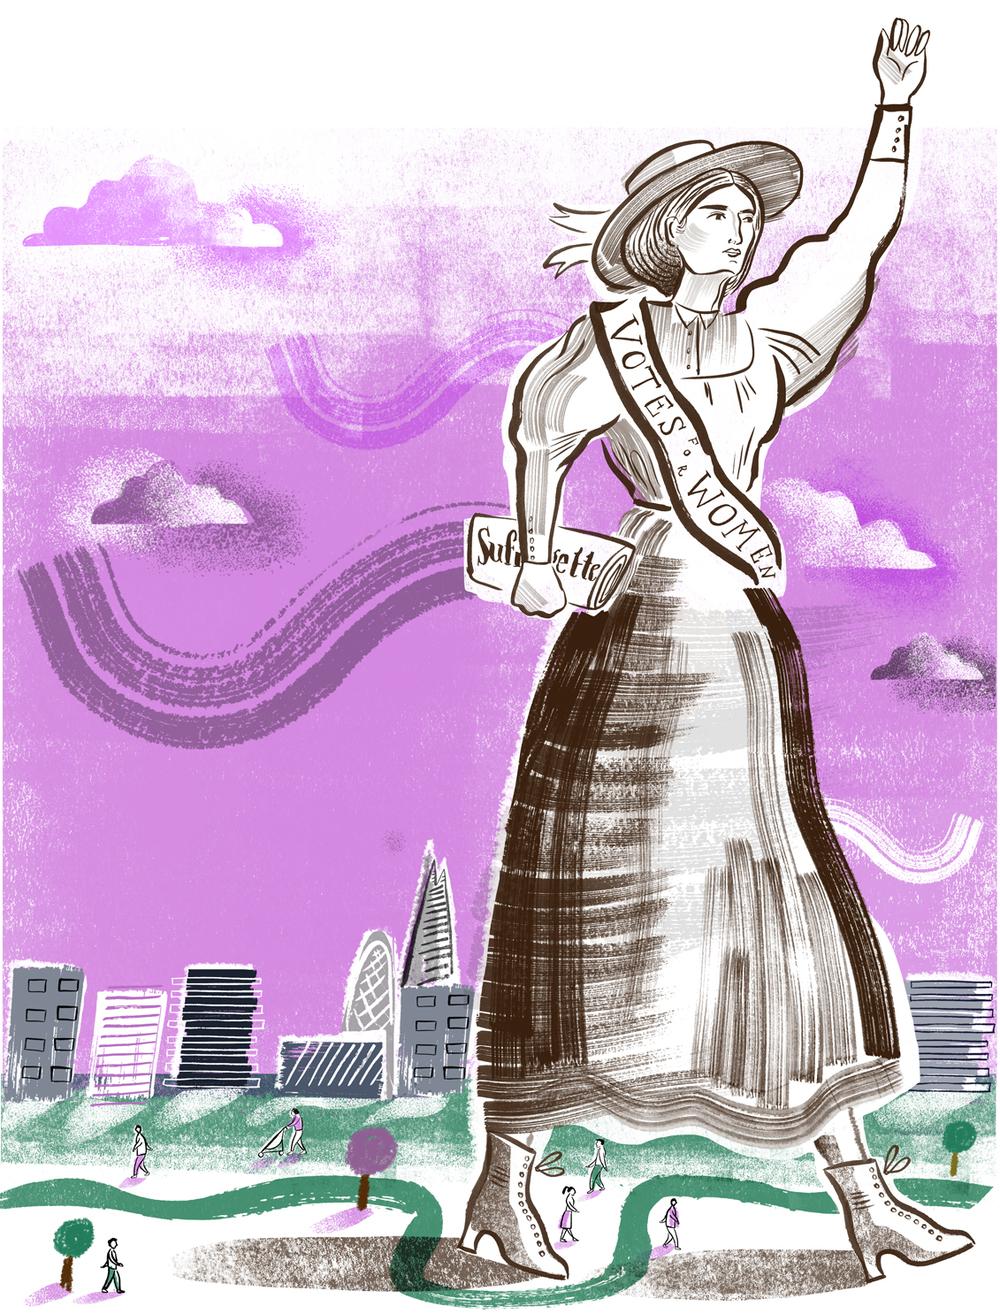 Suffragettesarahtanatjones-final.jpg